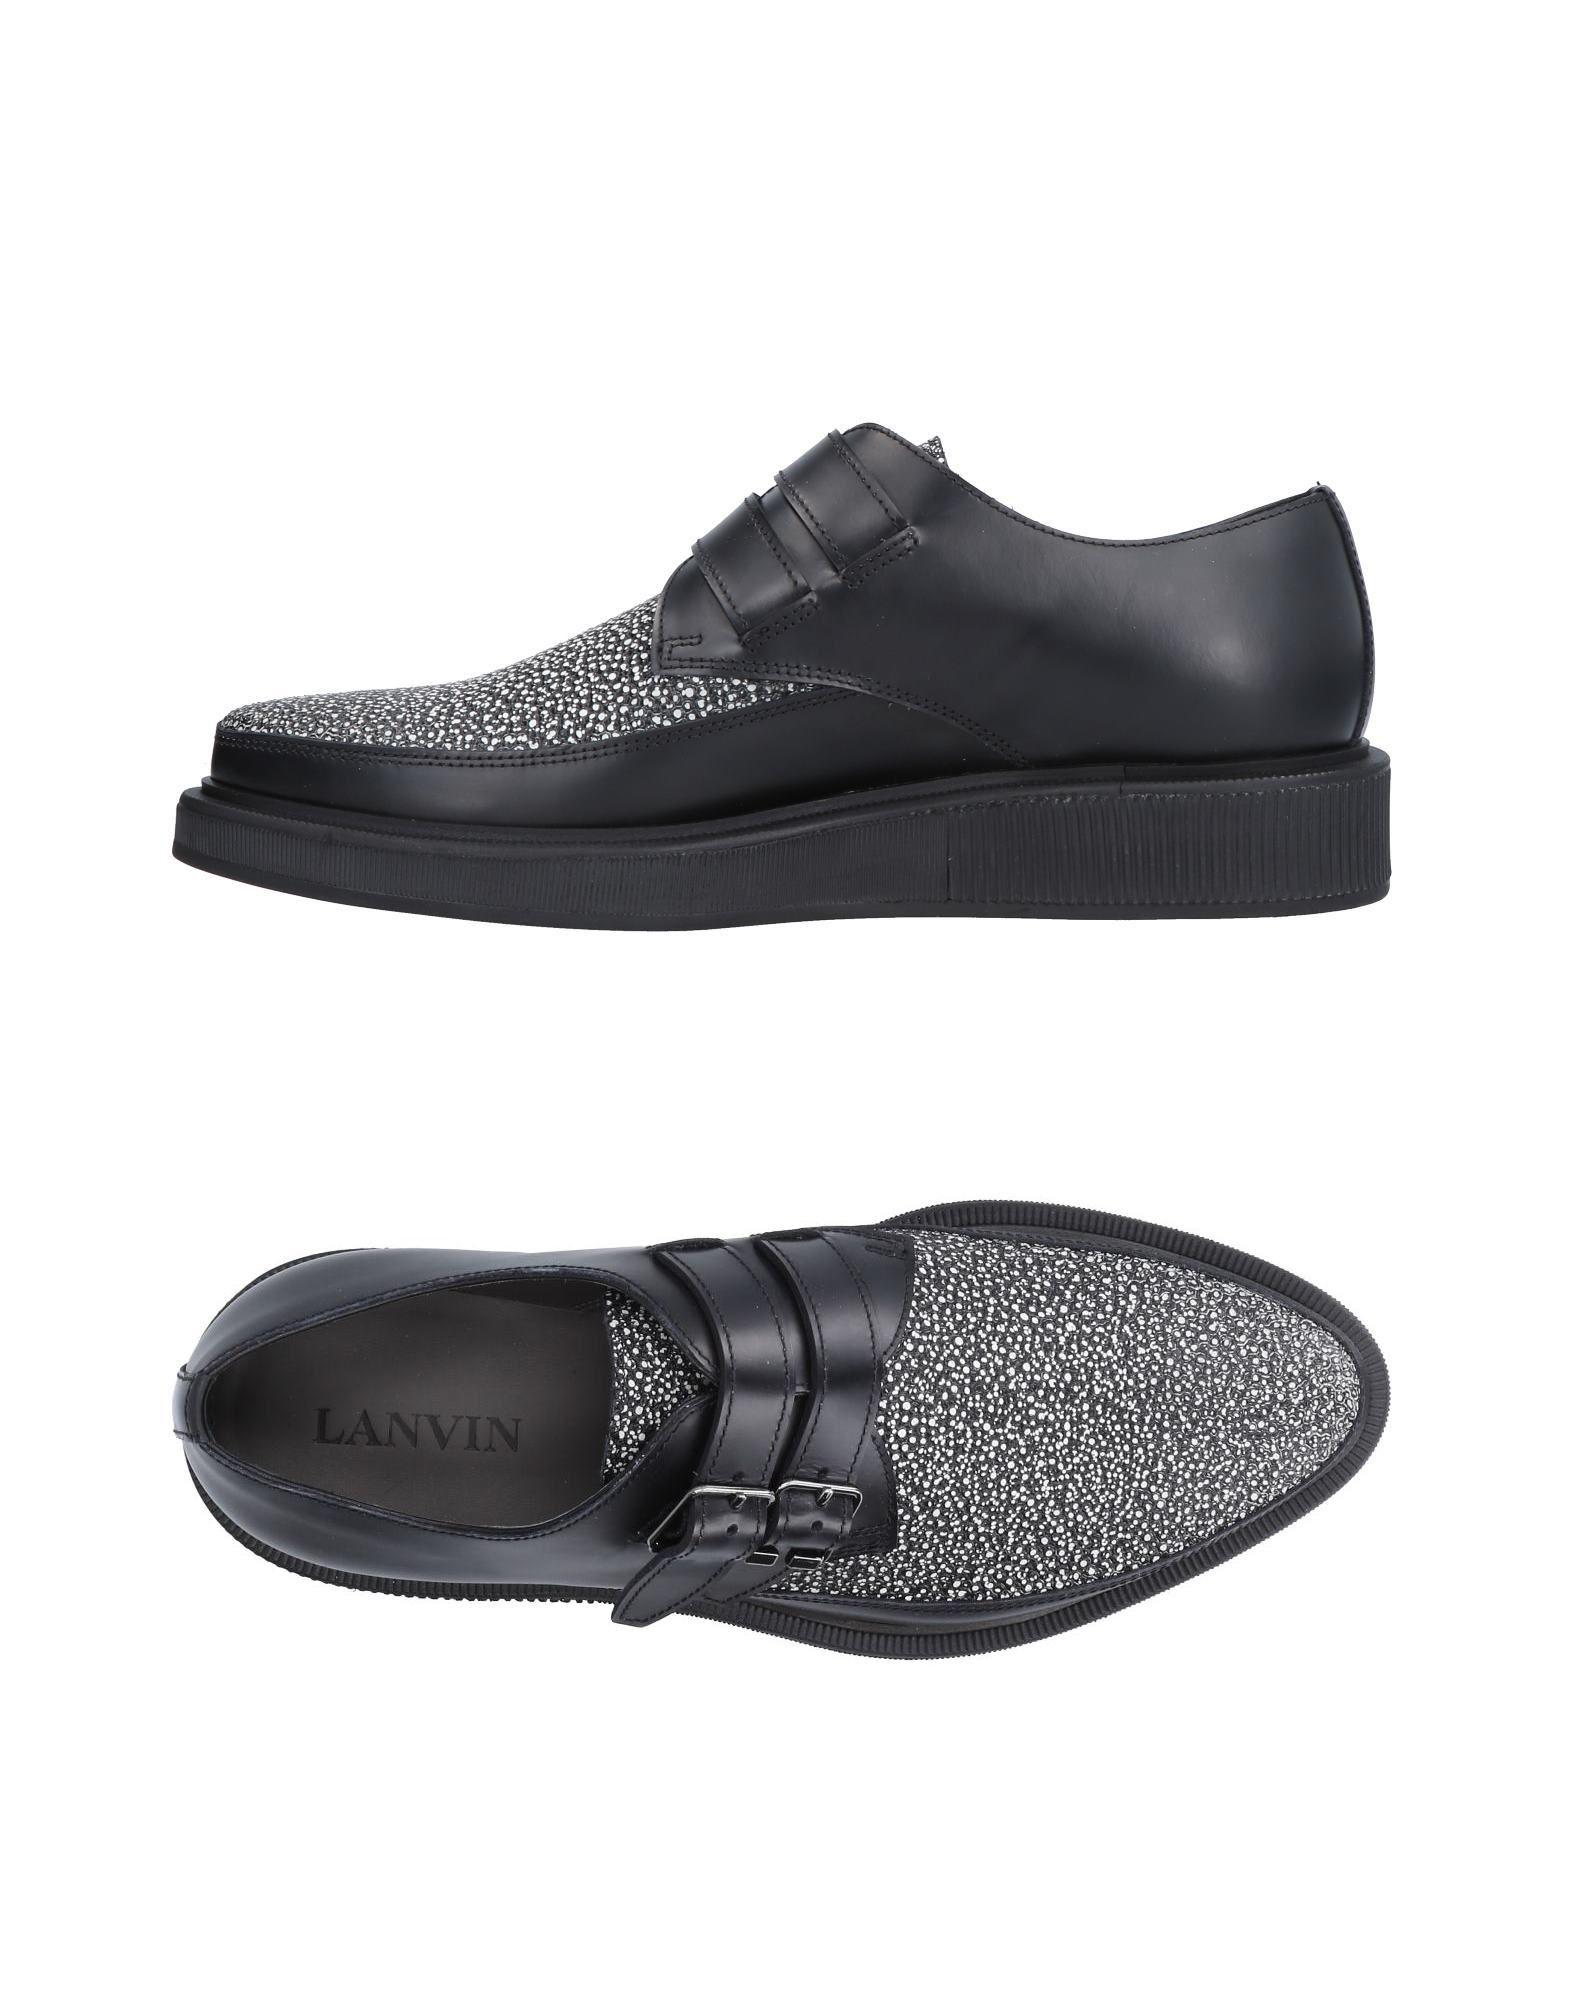 Lanvin Mokassins Herren  11514305EM Gute Qualität beliebte Schuhe